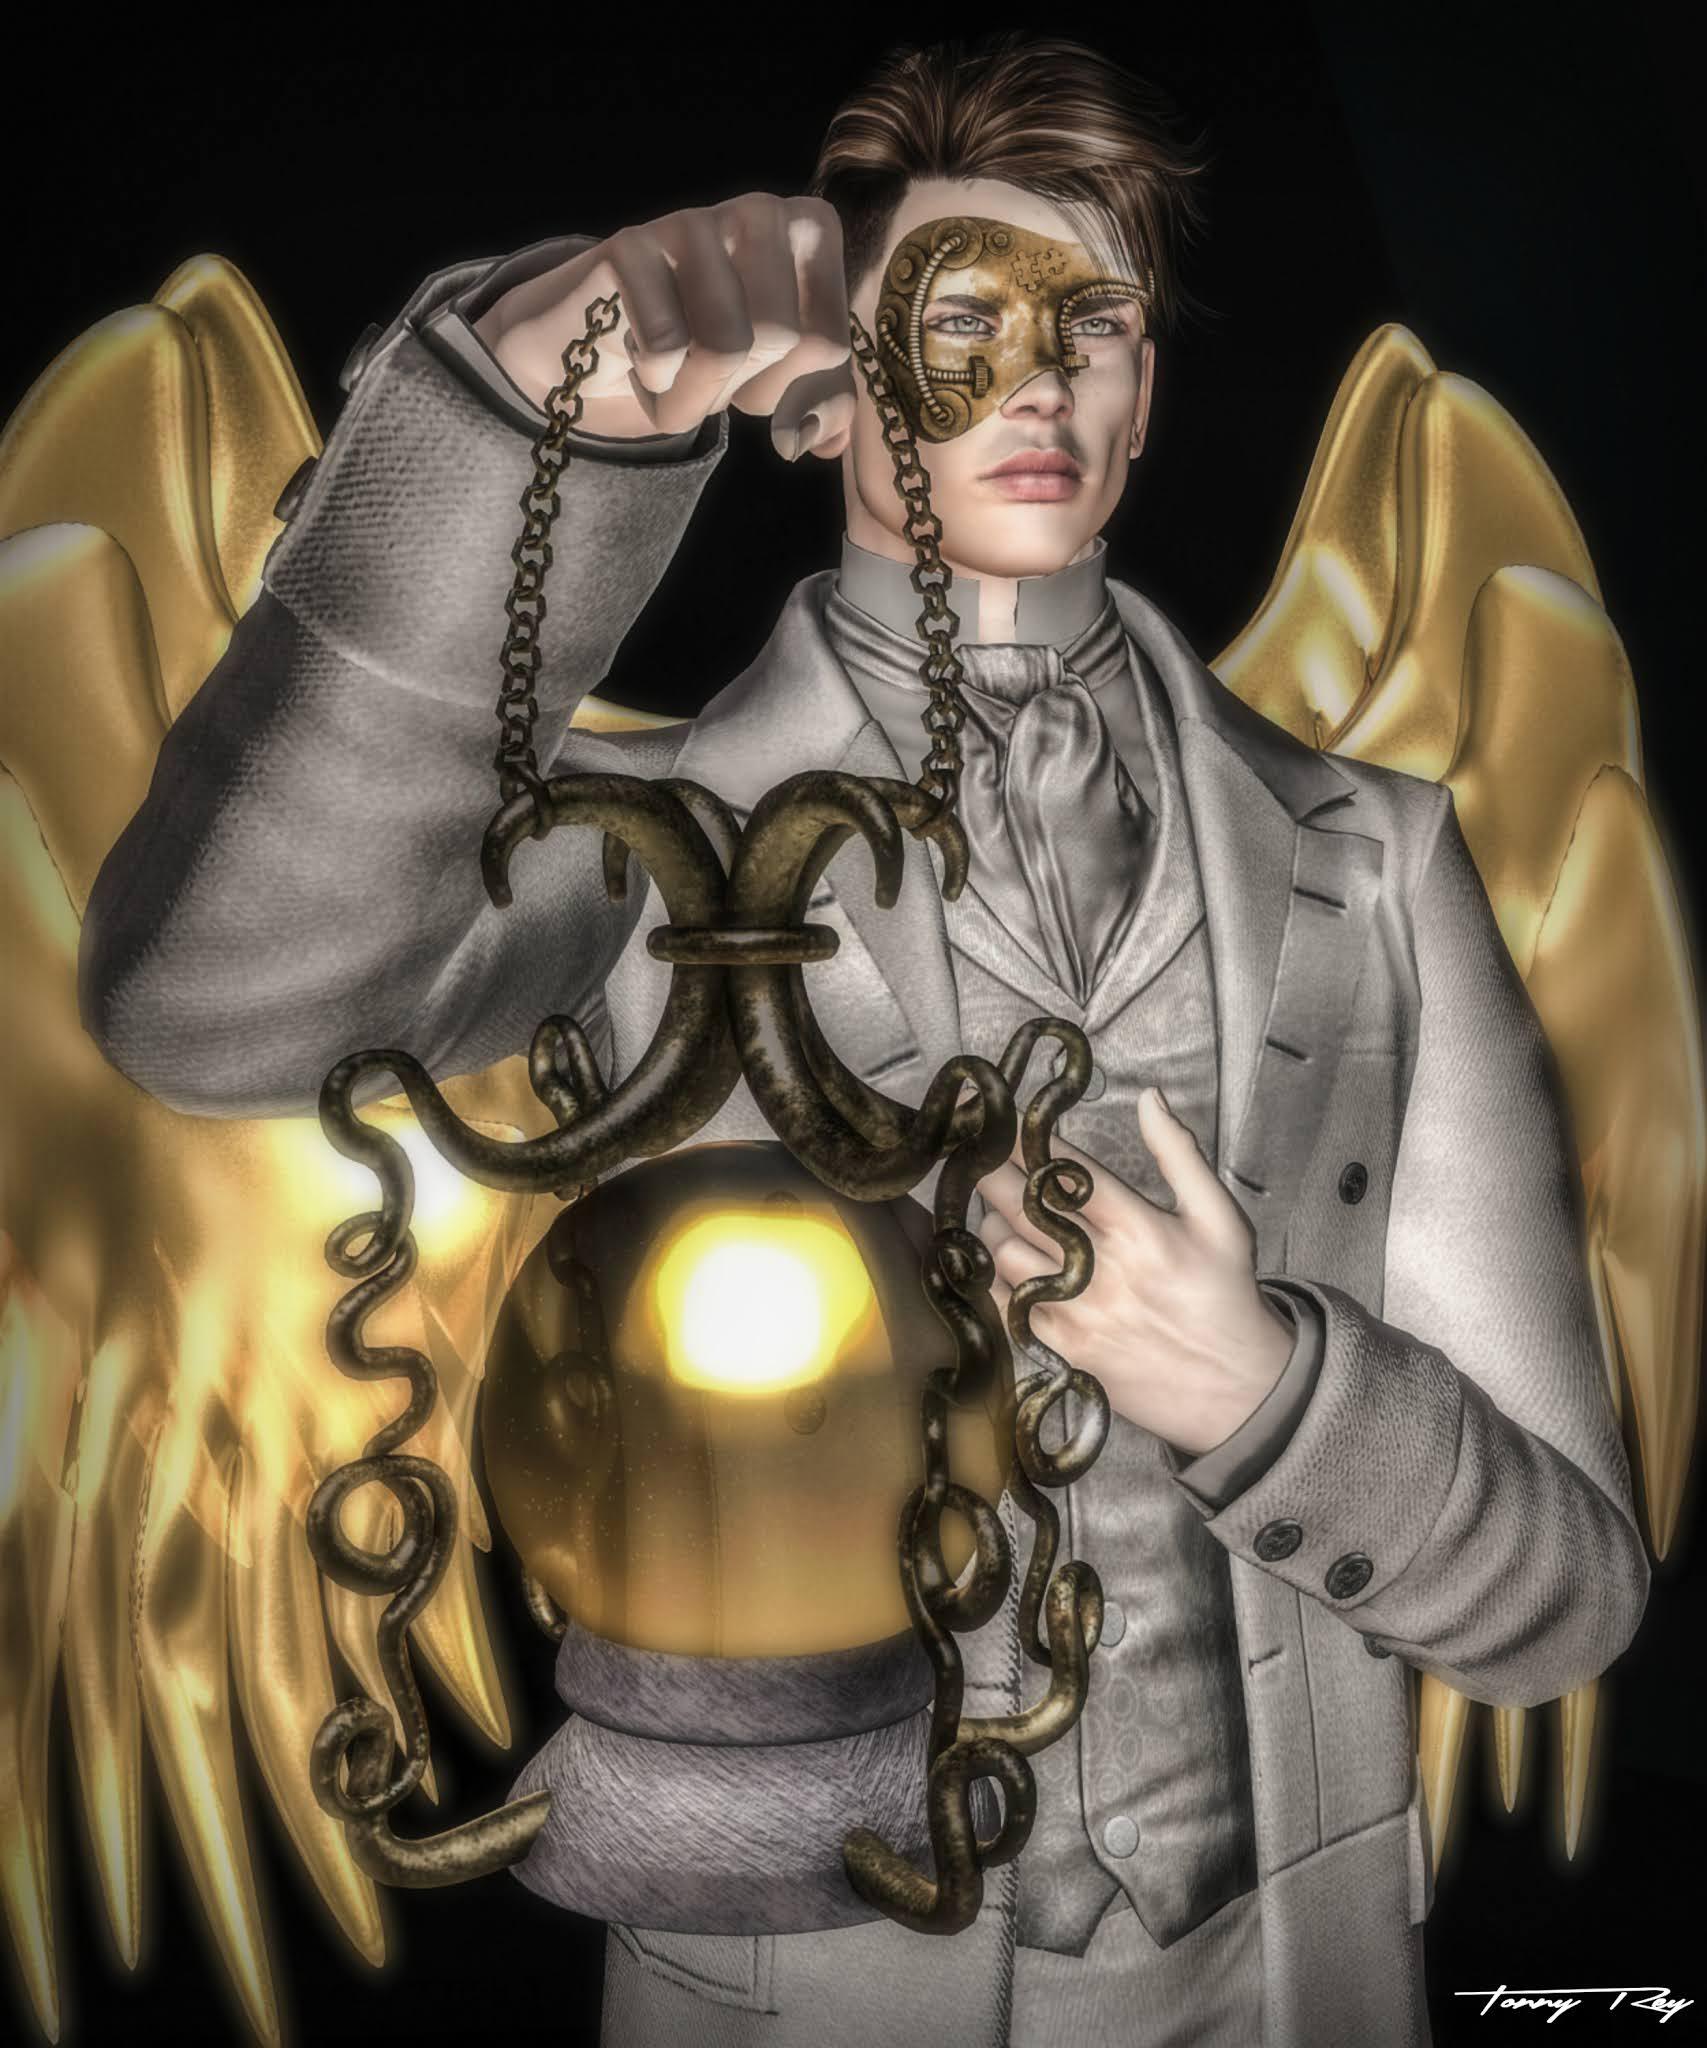 RAWR! - Magic Lantern...